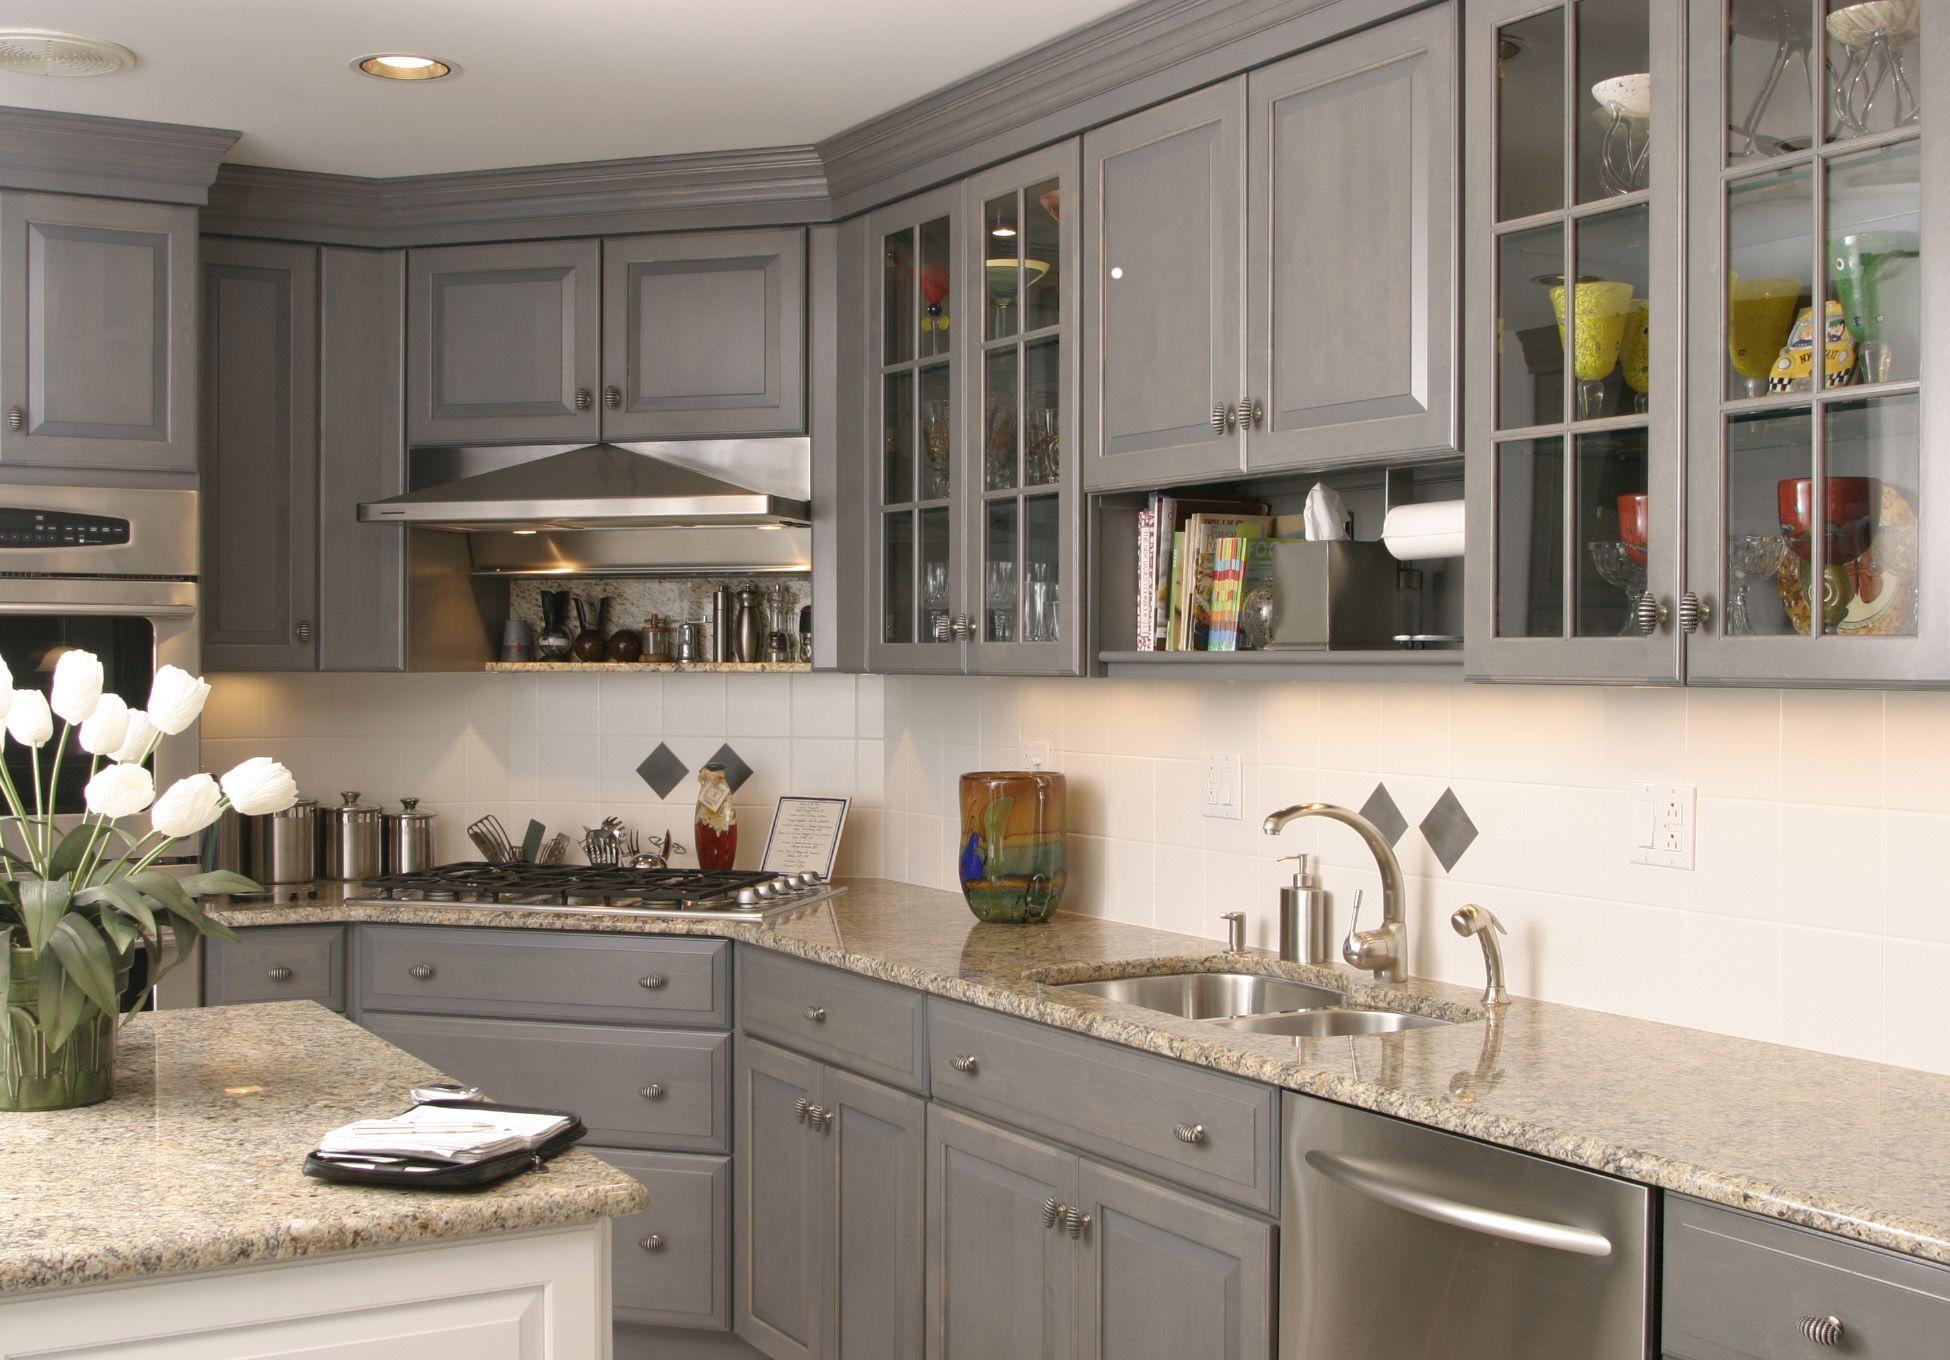 Custom Wood Products Kitchen Cabinets Kitchen Remodel Kitchen New Kitchen